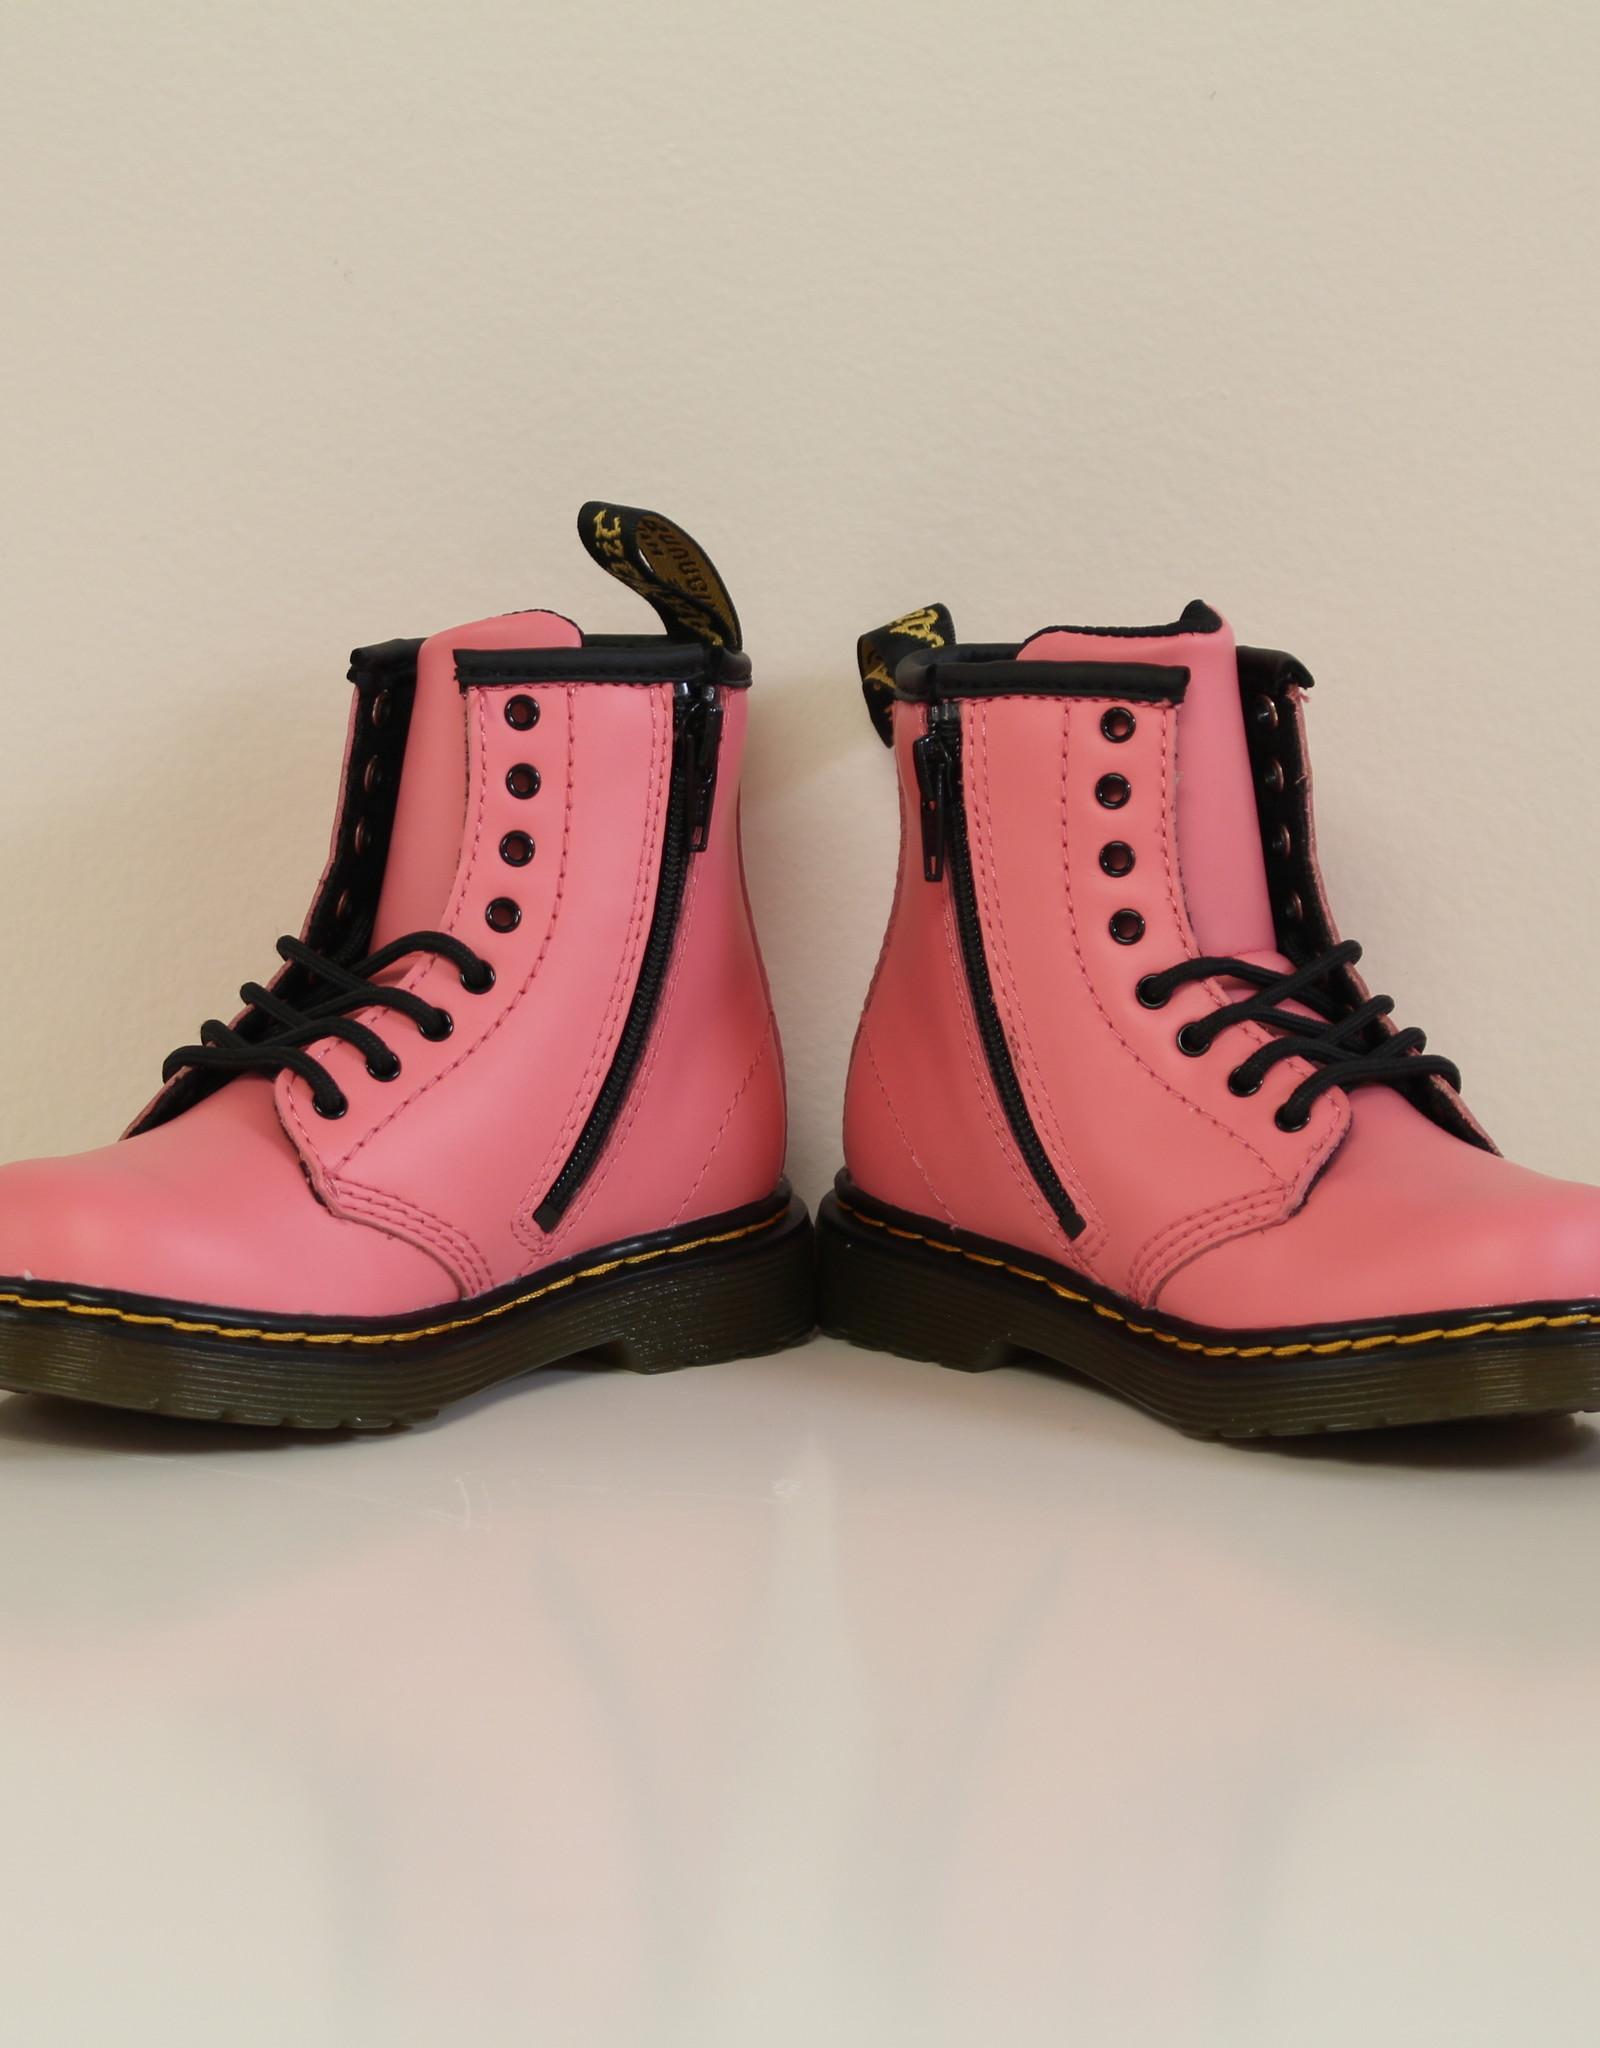 Dr Martens 1460 acid pink romario